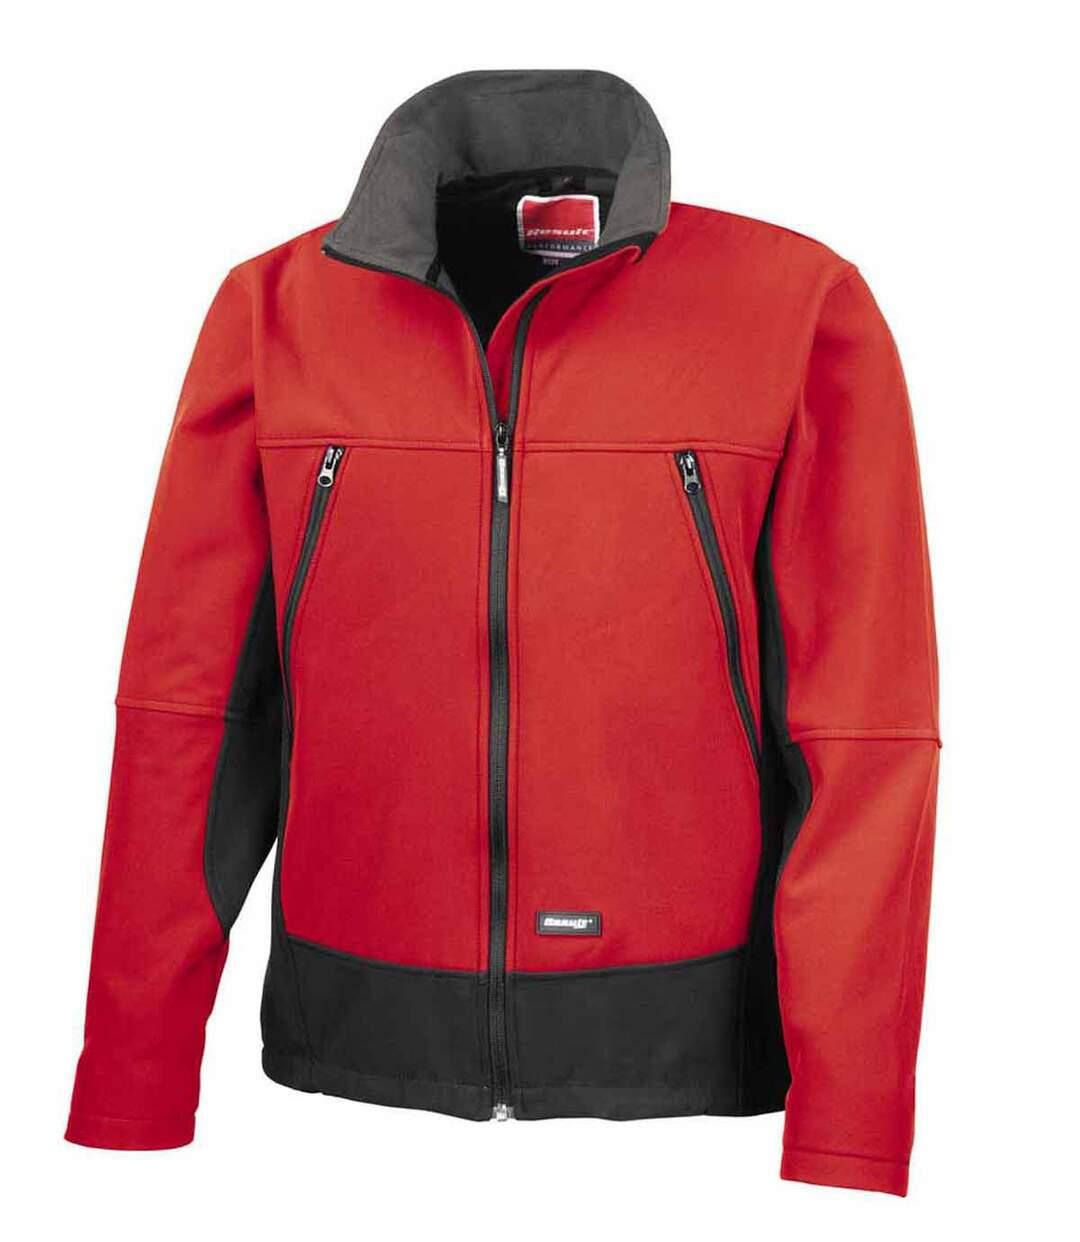 Veste softshell sport unisexe - R120X - rouge